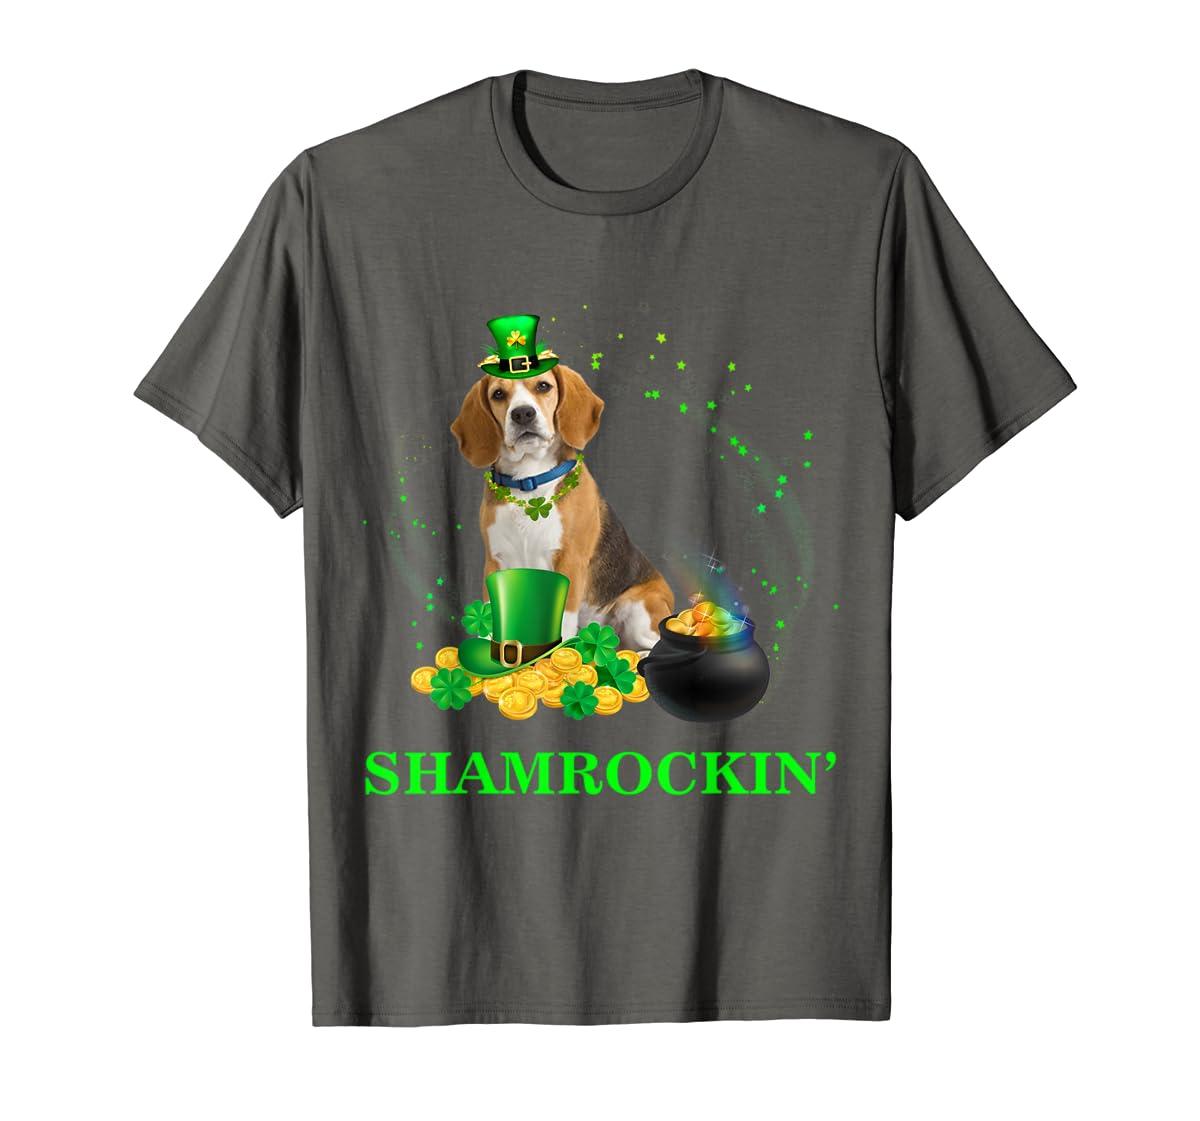 Shamrockin' Beagle St Patricks Day Tshirt Dog Gifts-Men's T-Shirt-Dark Heather